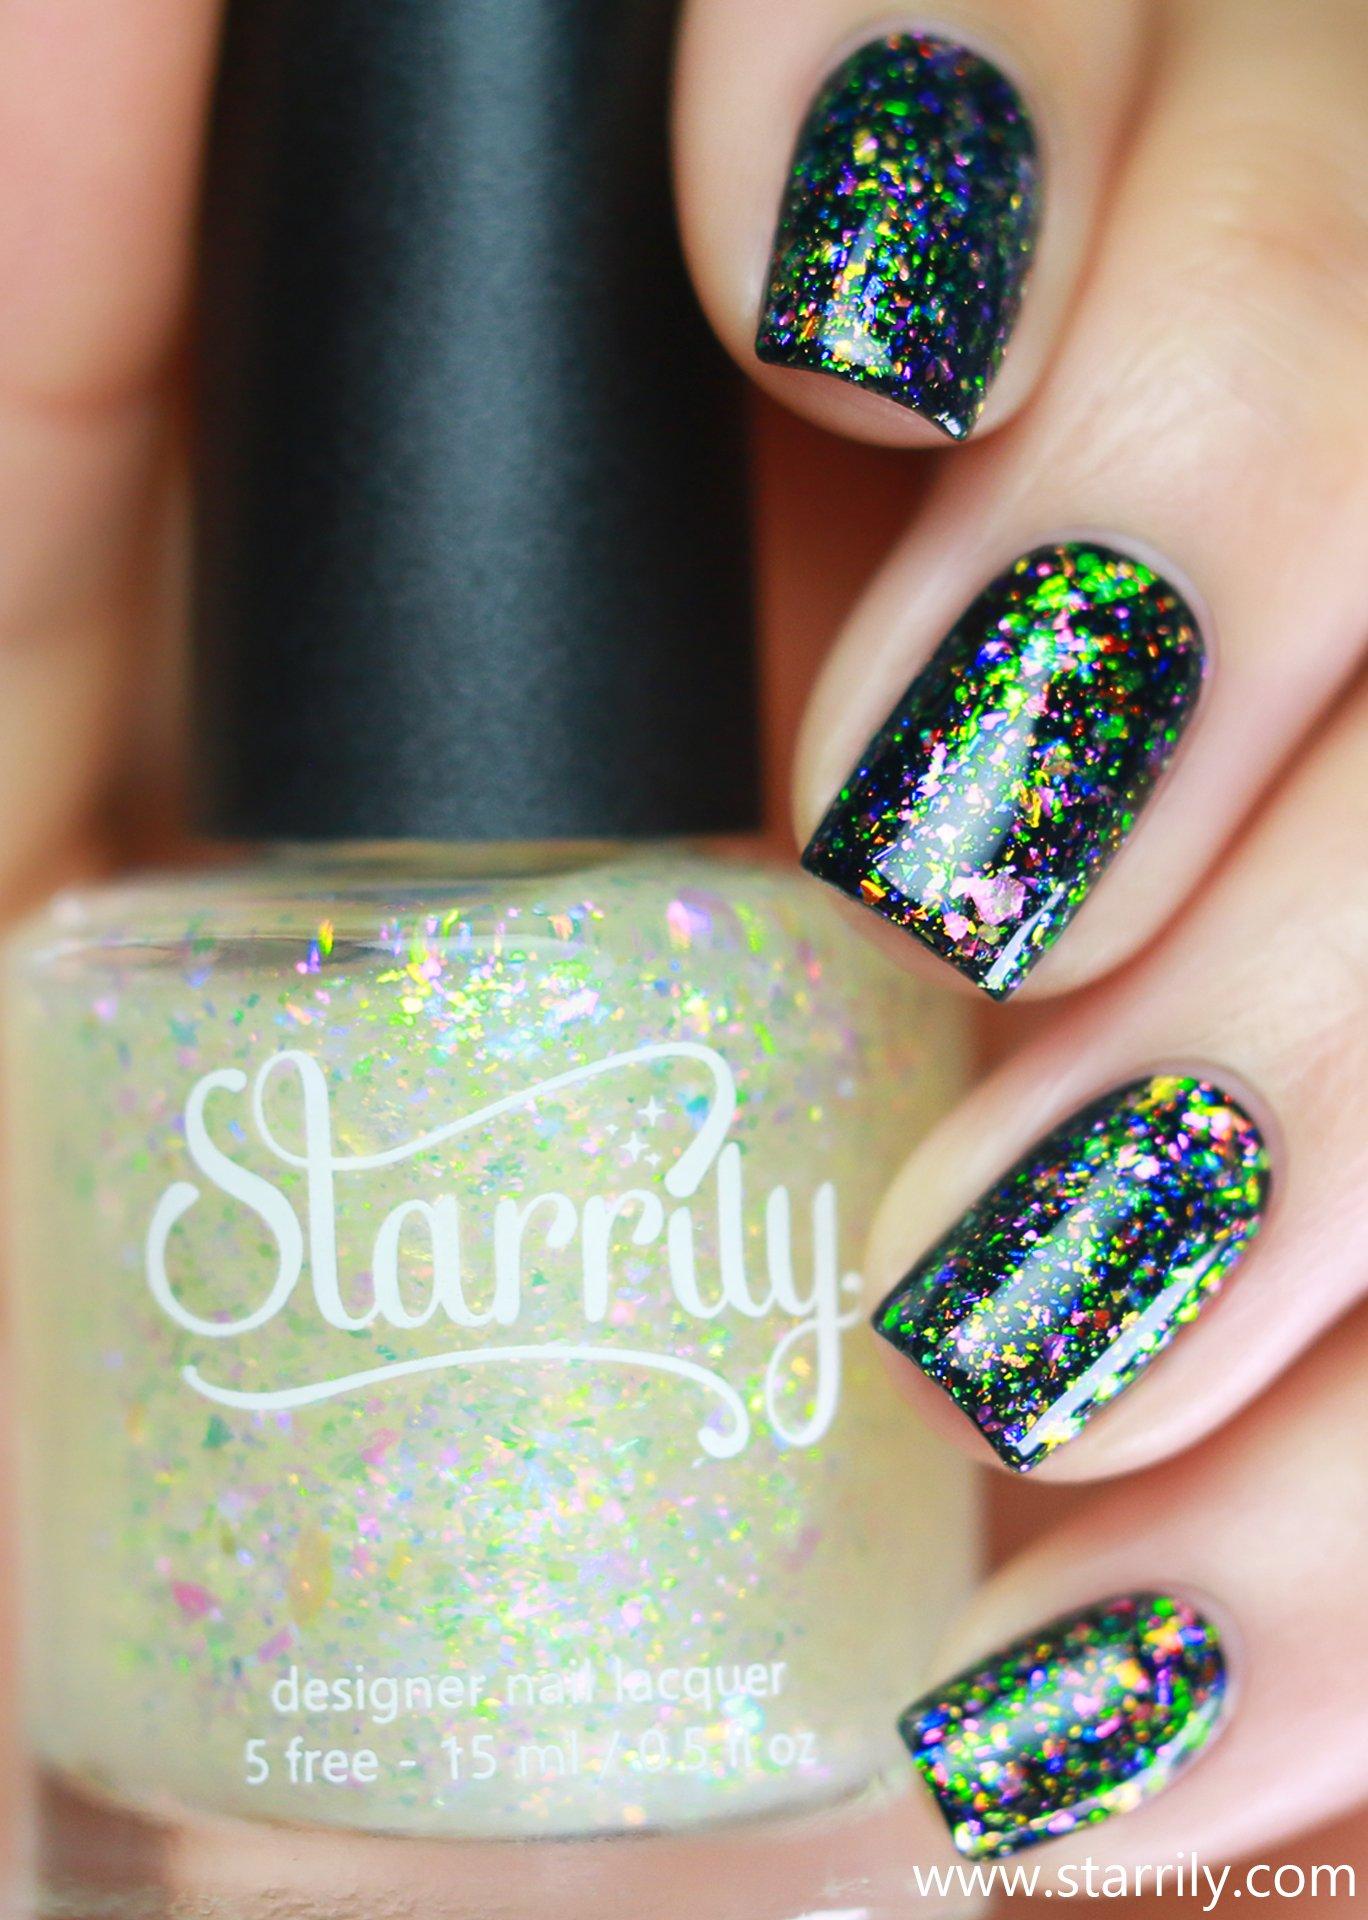 Starrily Nail Polish - Unicorn - Nail-Artisan